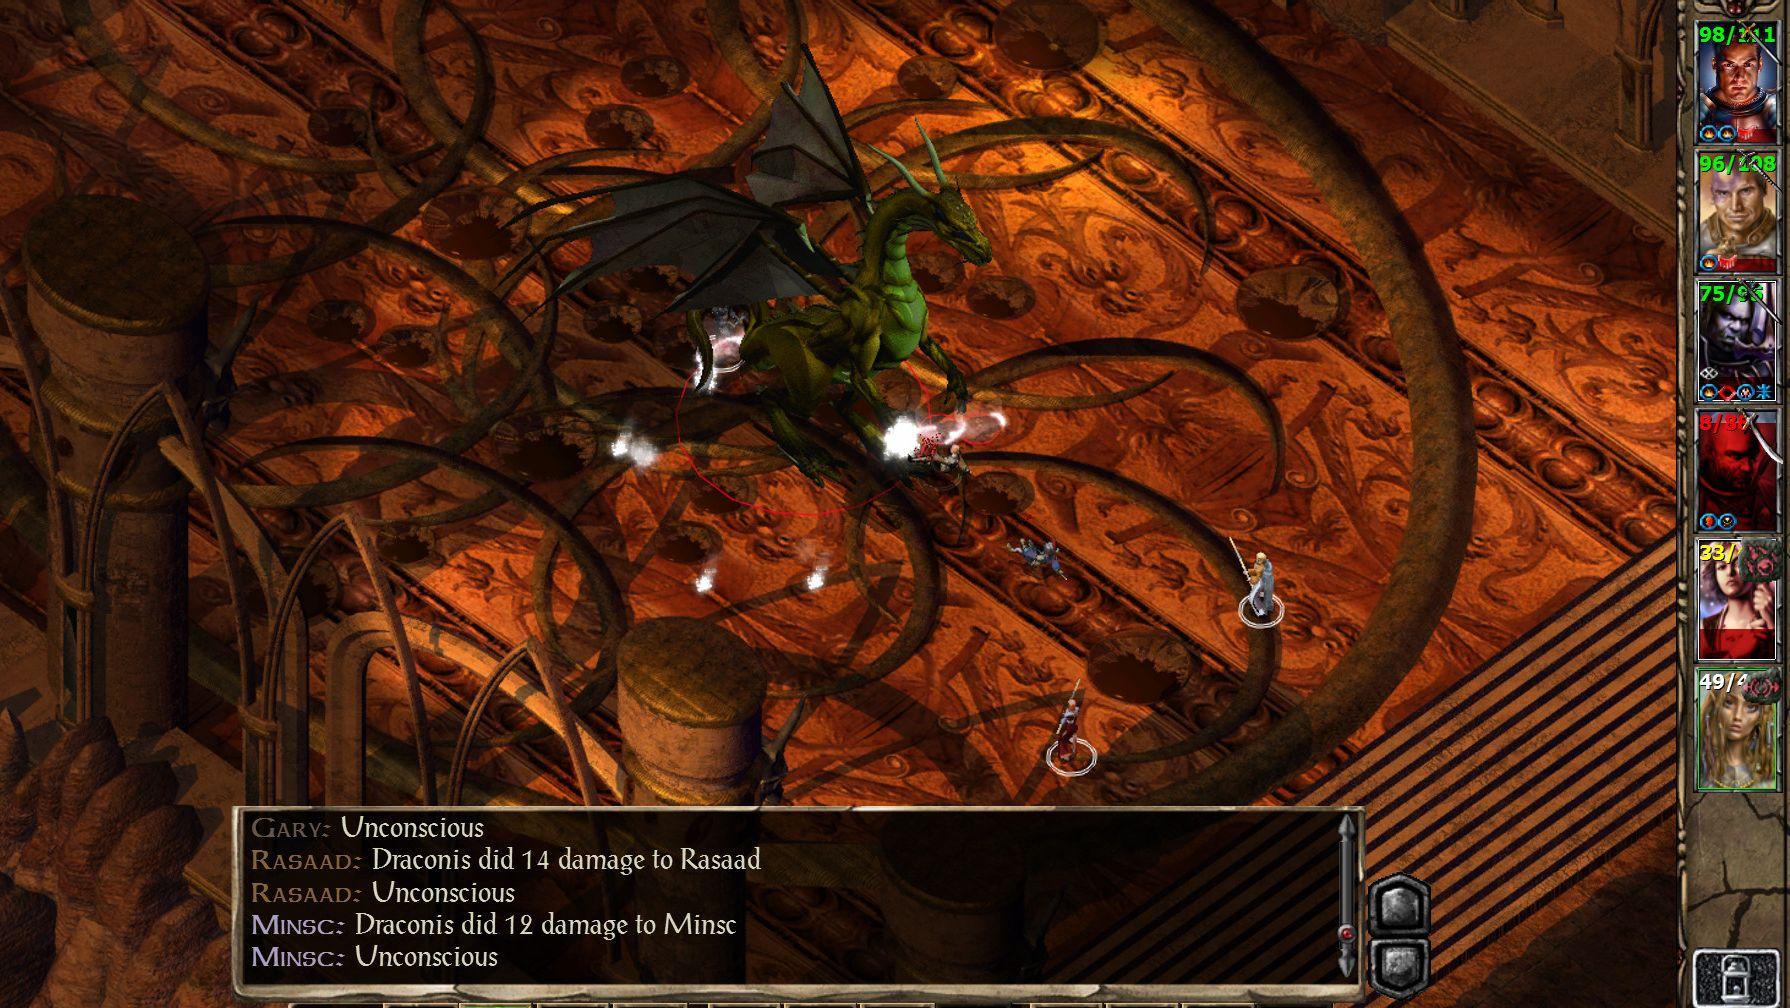 Una captura de pantalla de la fiesta que lucha contra un gran dragón en Baldur's Gate II, porque no tenía una captura de pantalla del Baldur's Gate original.